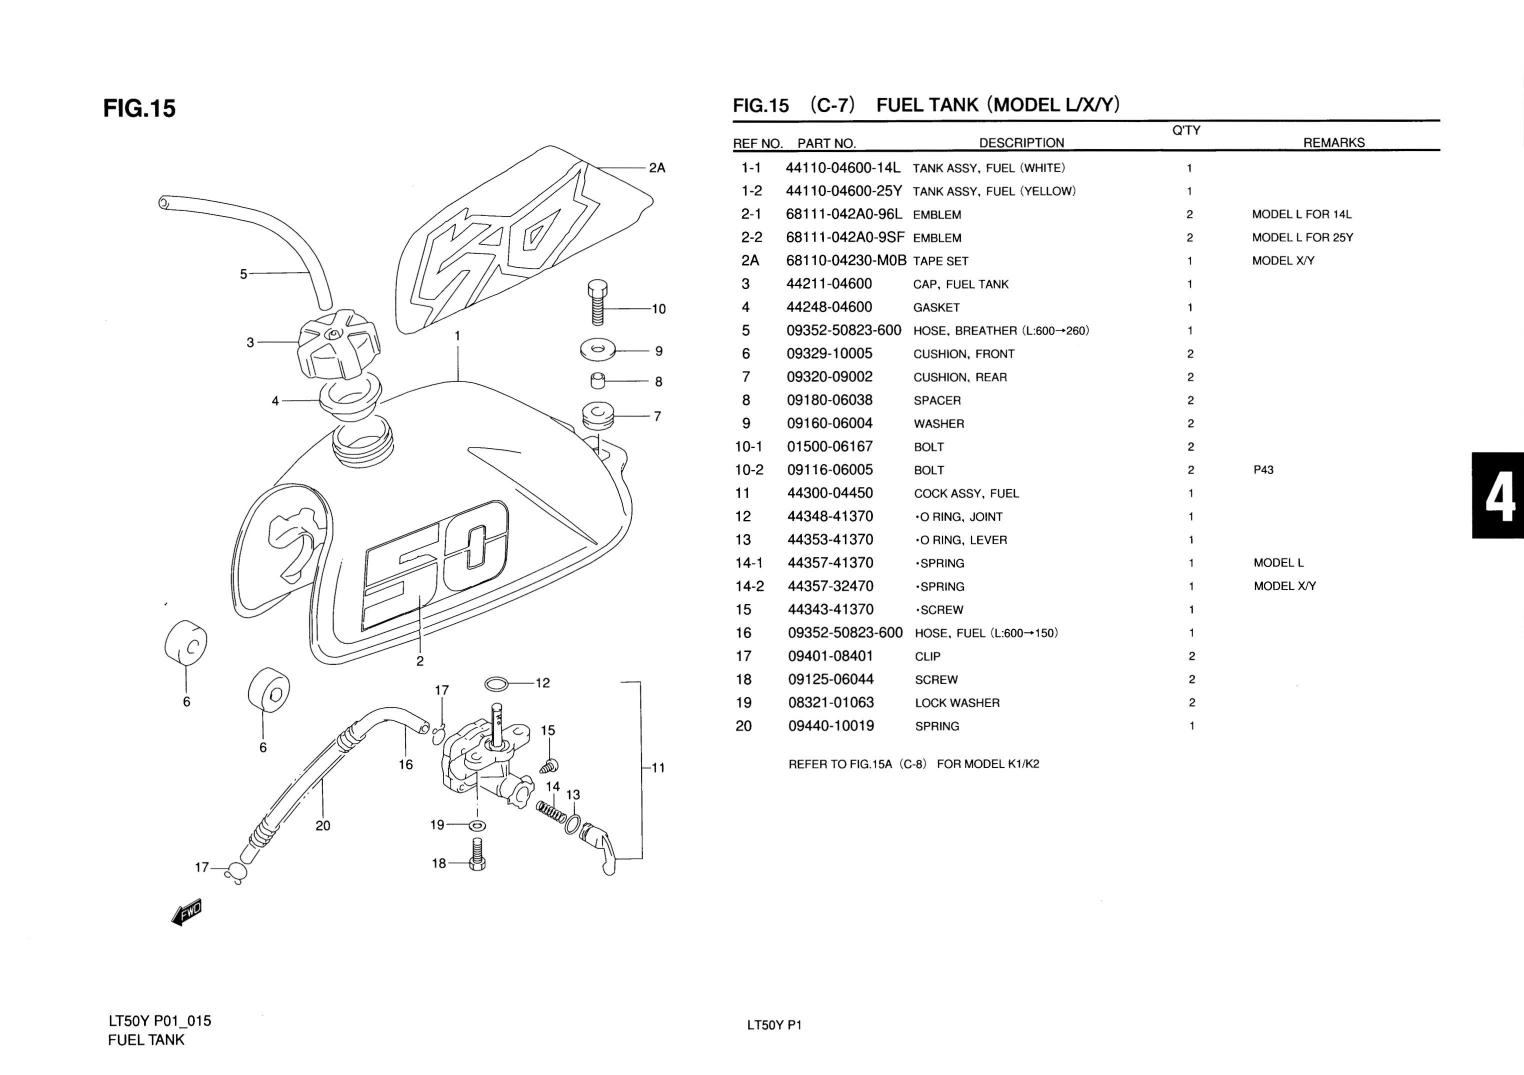 1997 suzuki lt50 parts diagram karcher puzzi 100 genuine model l x y atv fuel tank